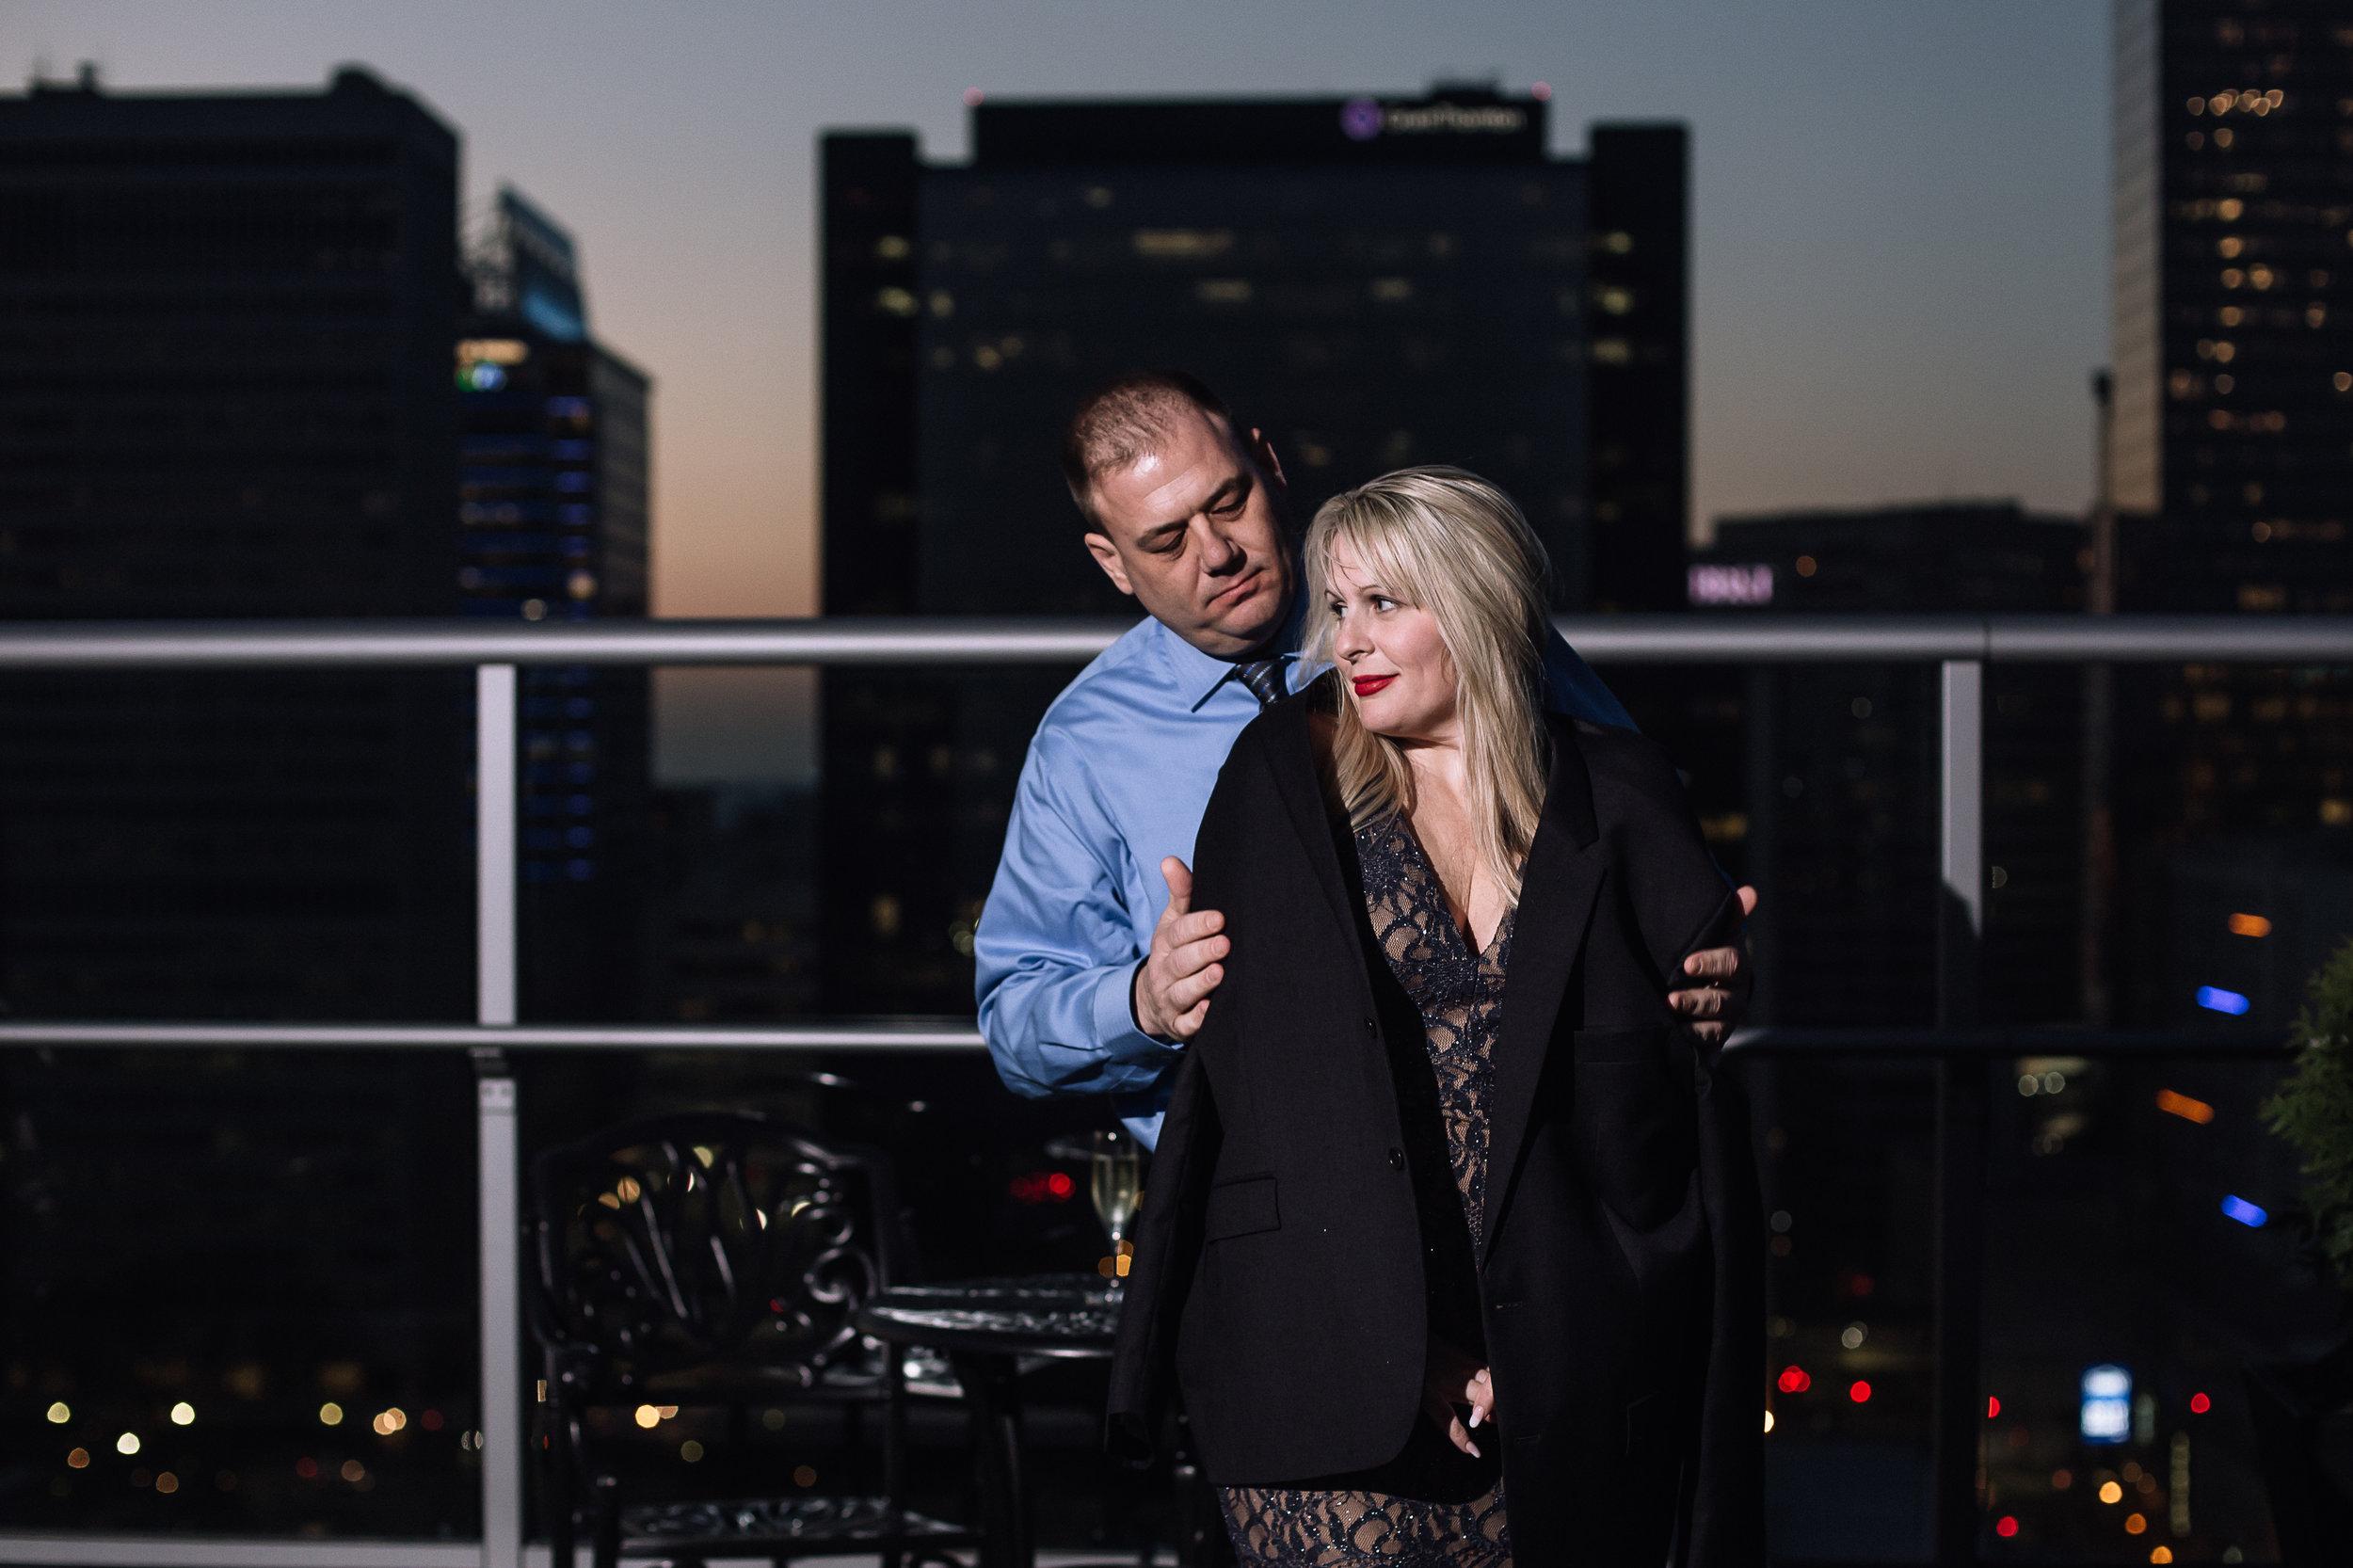 charlotte north carolina wedding photographer surprise proposal fahrenheit